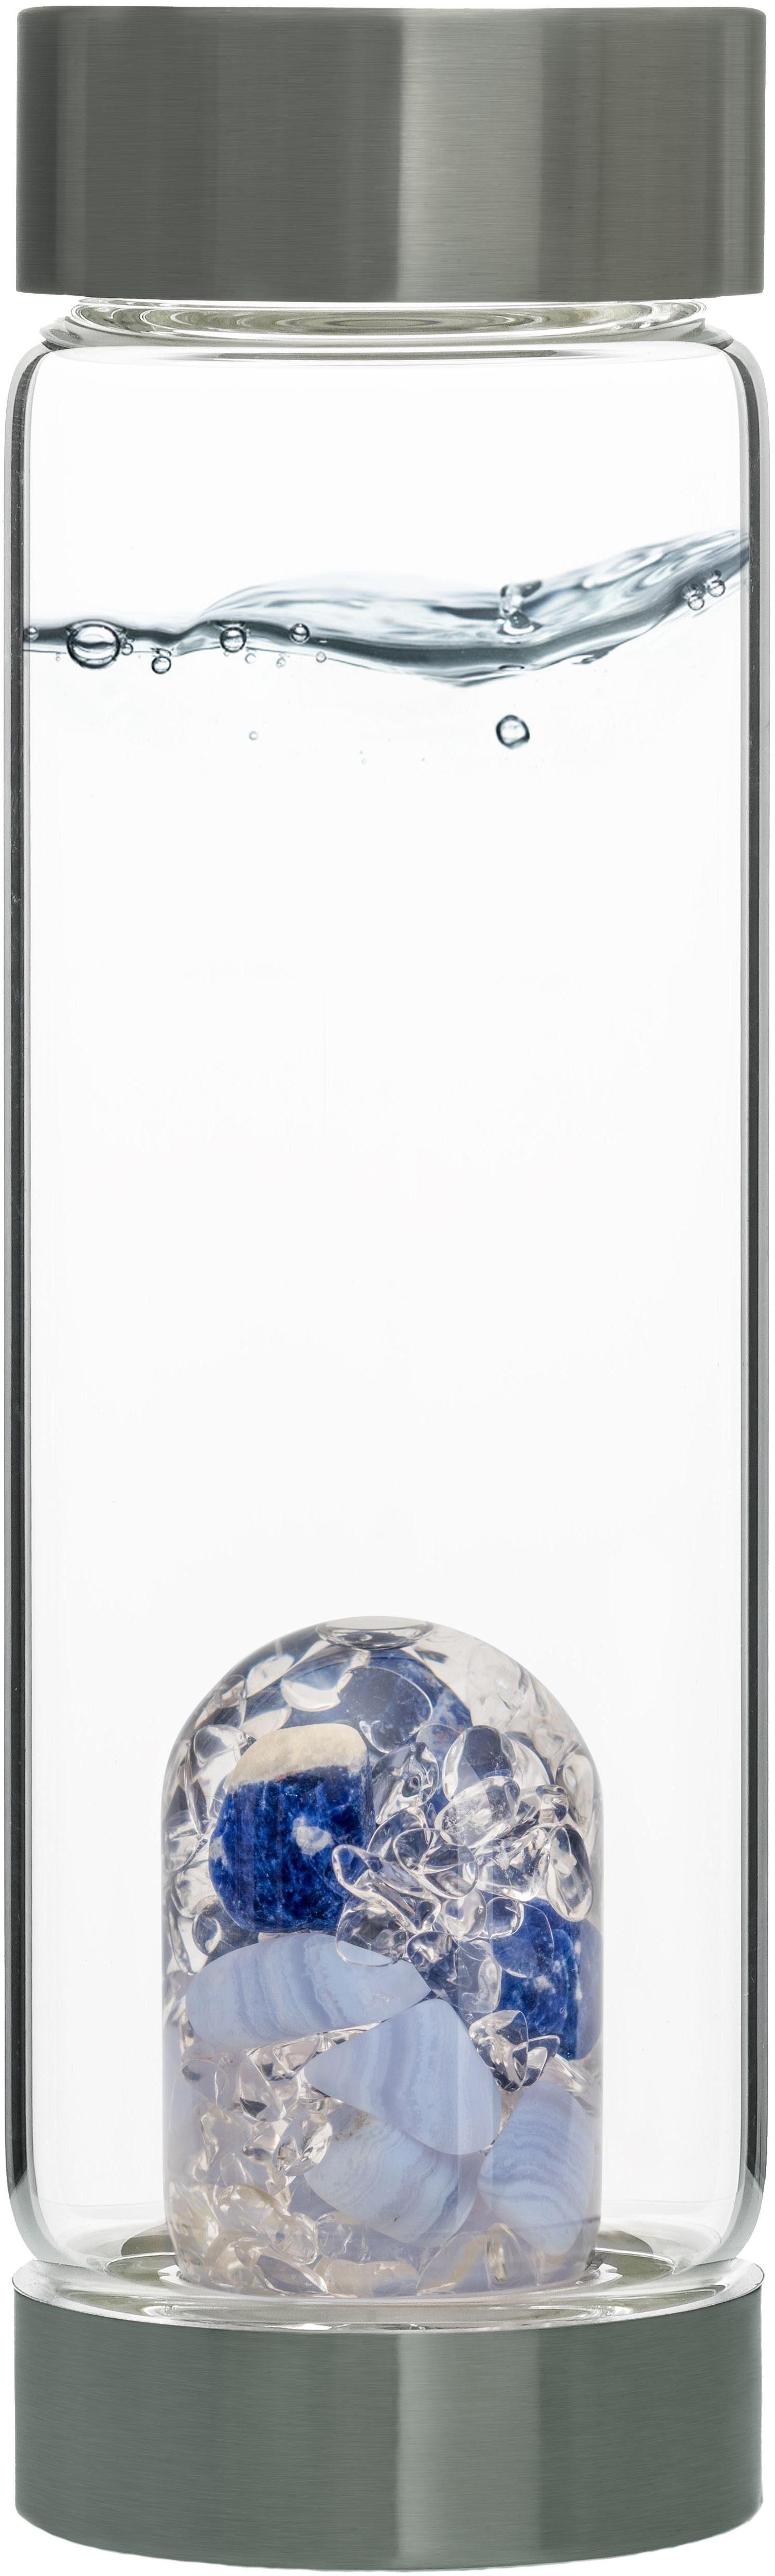 VitaJuwel Wasserkaraffe »Edelsteinflasche ViA Balance«, (Sodalith - Chalcedon - Bergkristall)